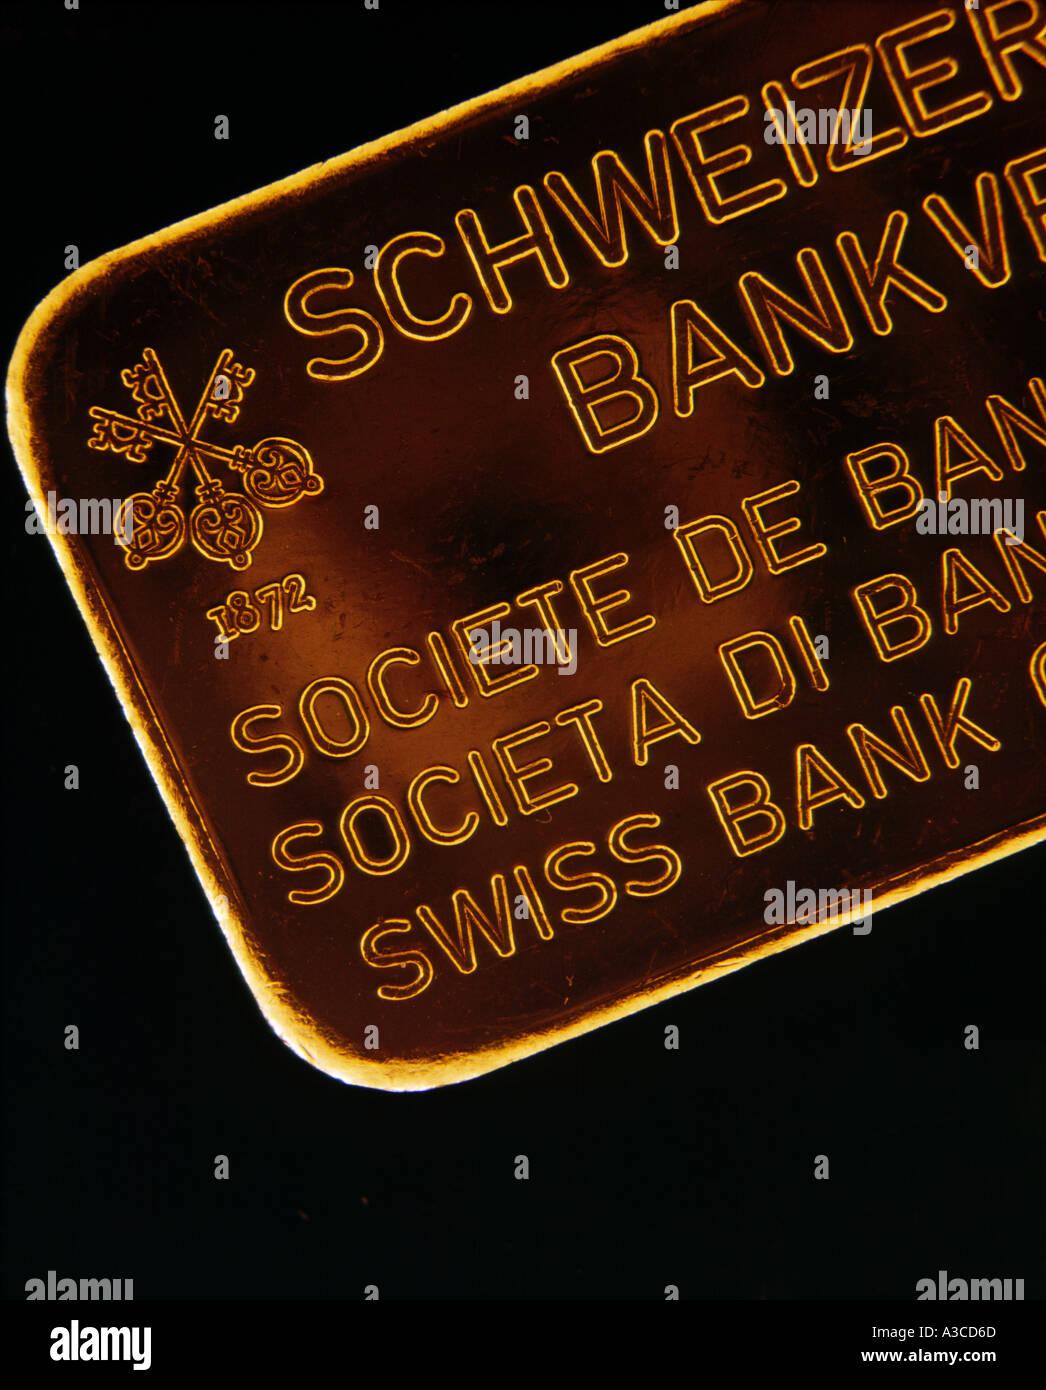 Swiss bank stock photos swiss bank stock images alamy solid gold bar swiss bank corporation stock image buycottarizona Image collections